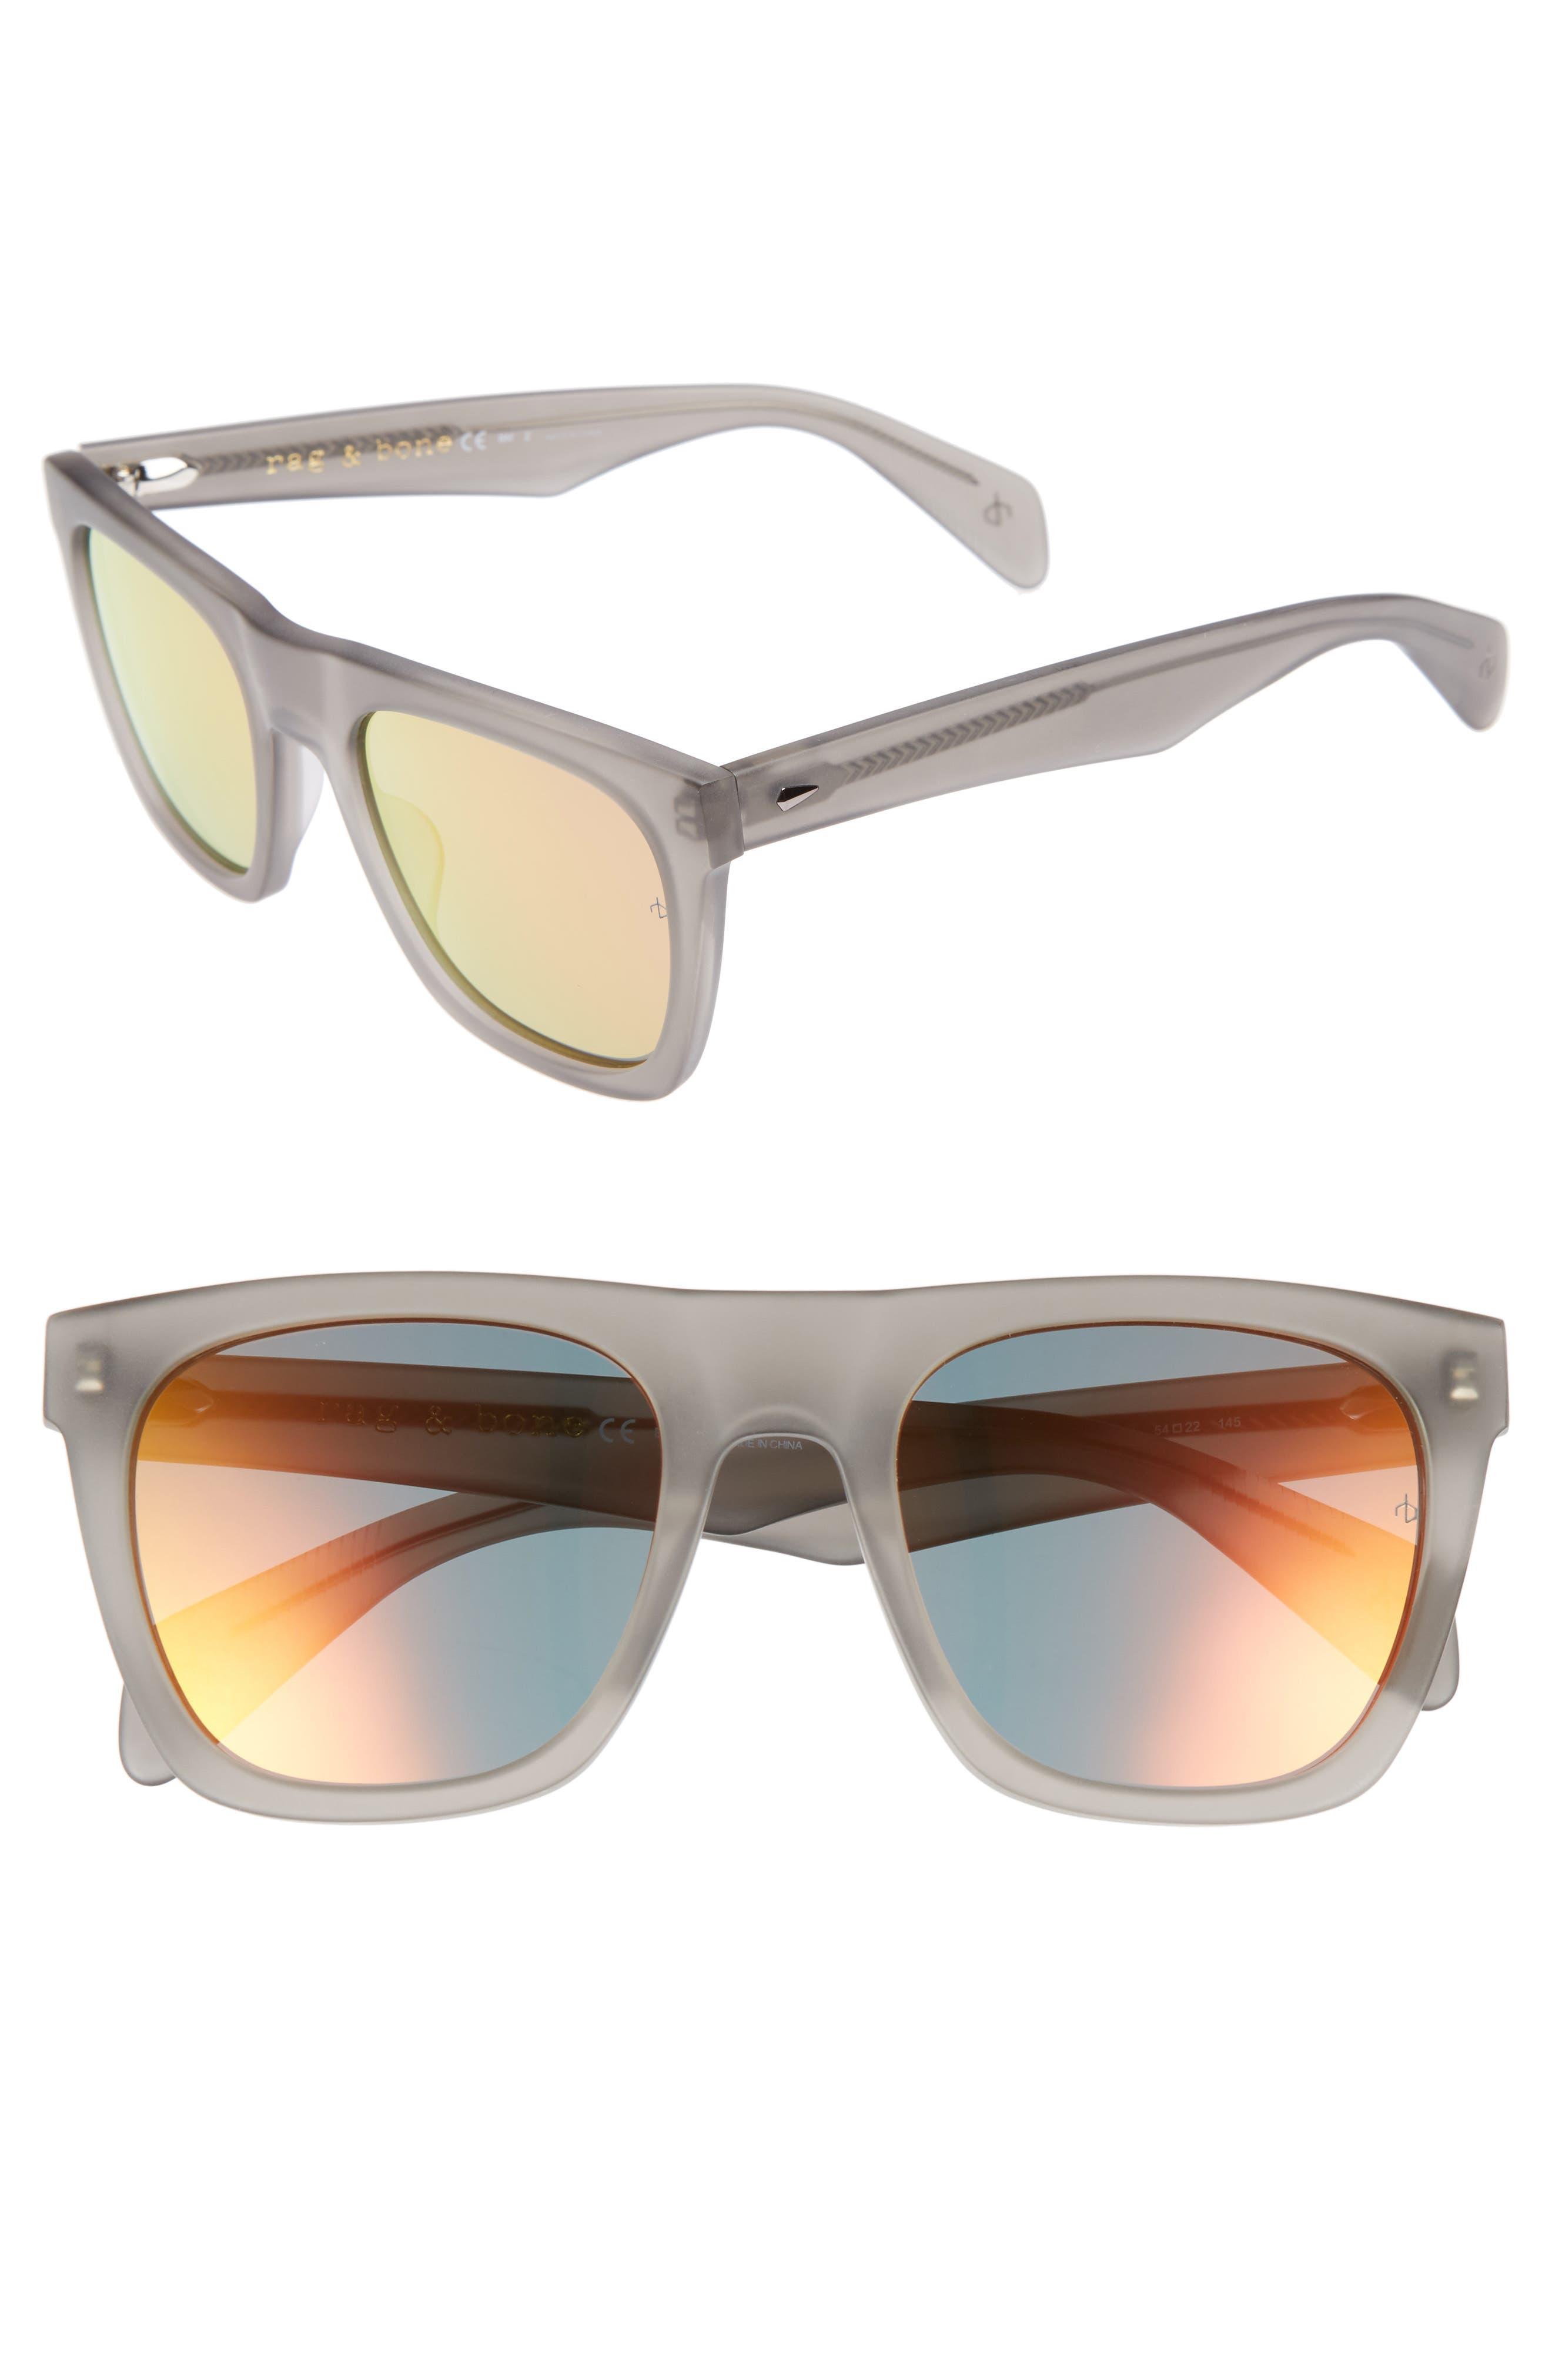 54mm Mirrored Sunglasses,                             Main thumbnail 1, color,                             Matte Grey